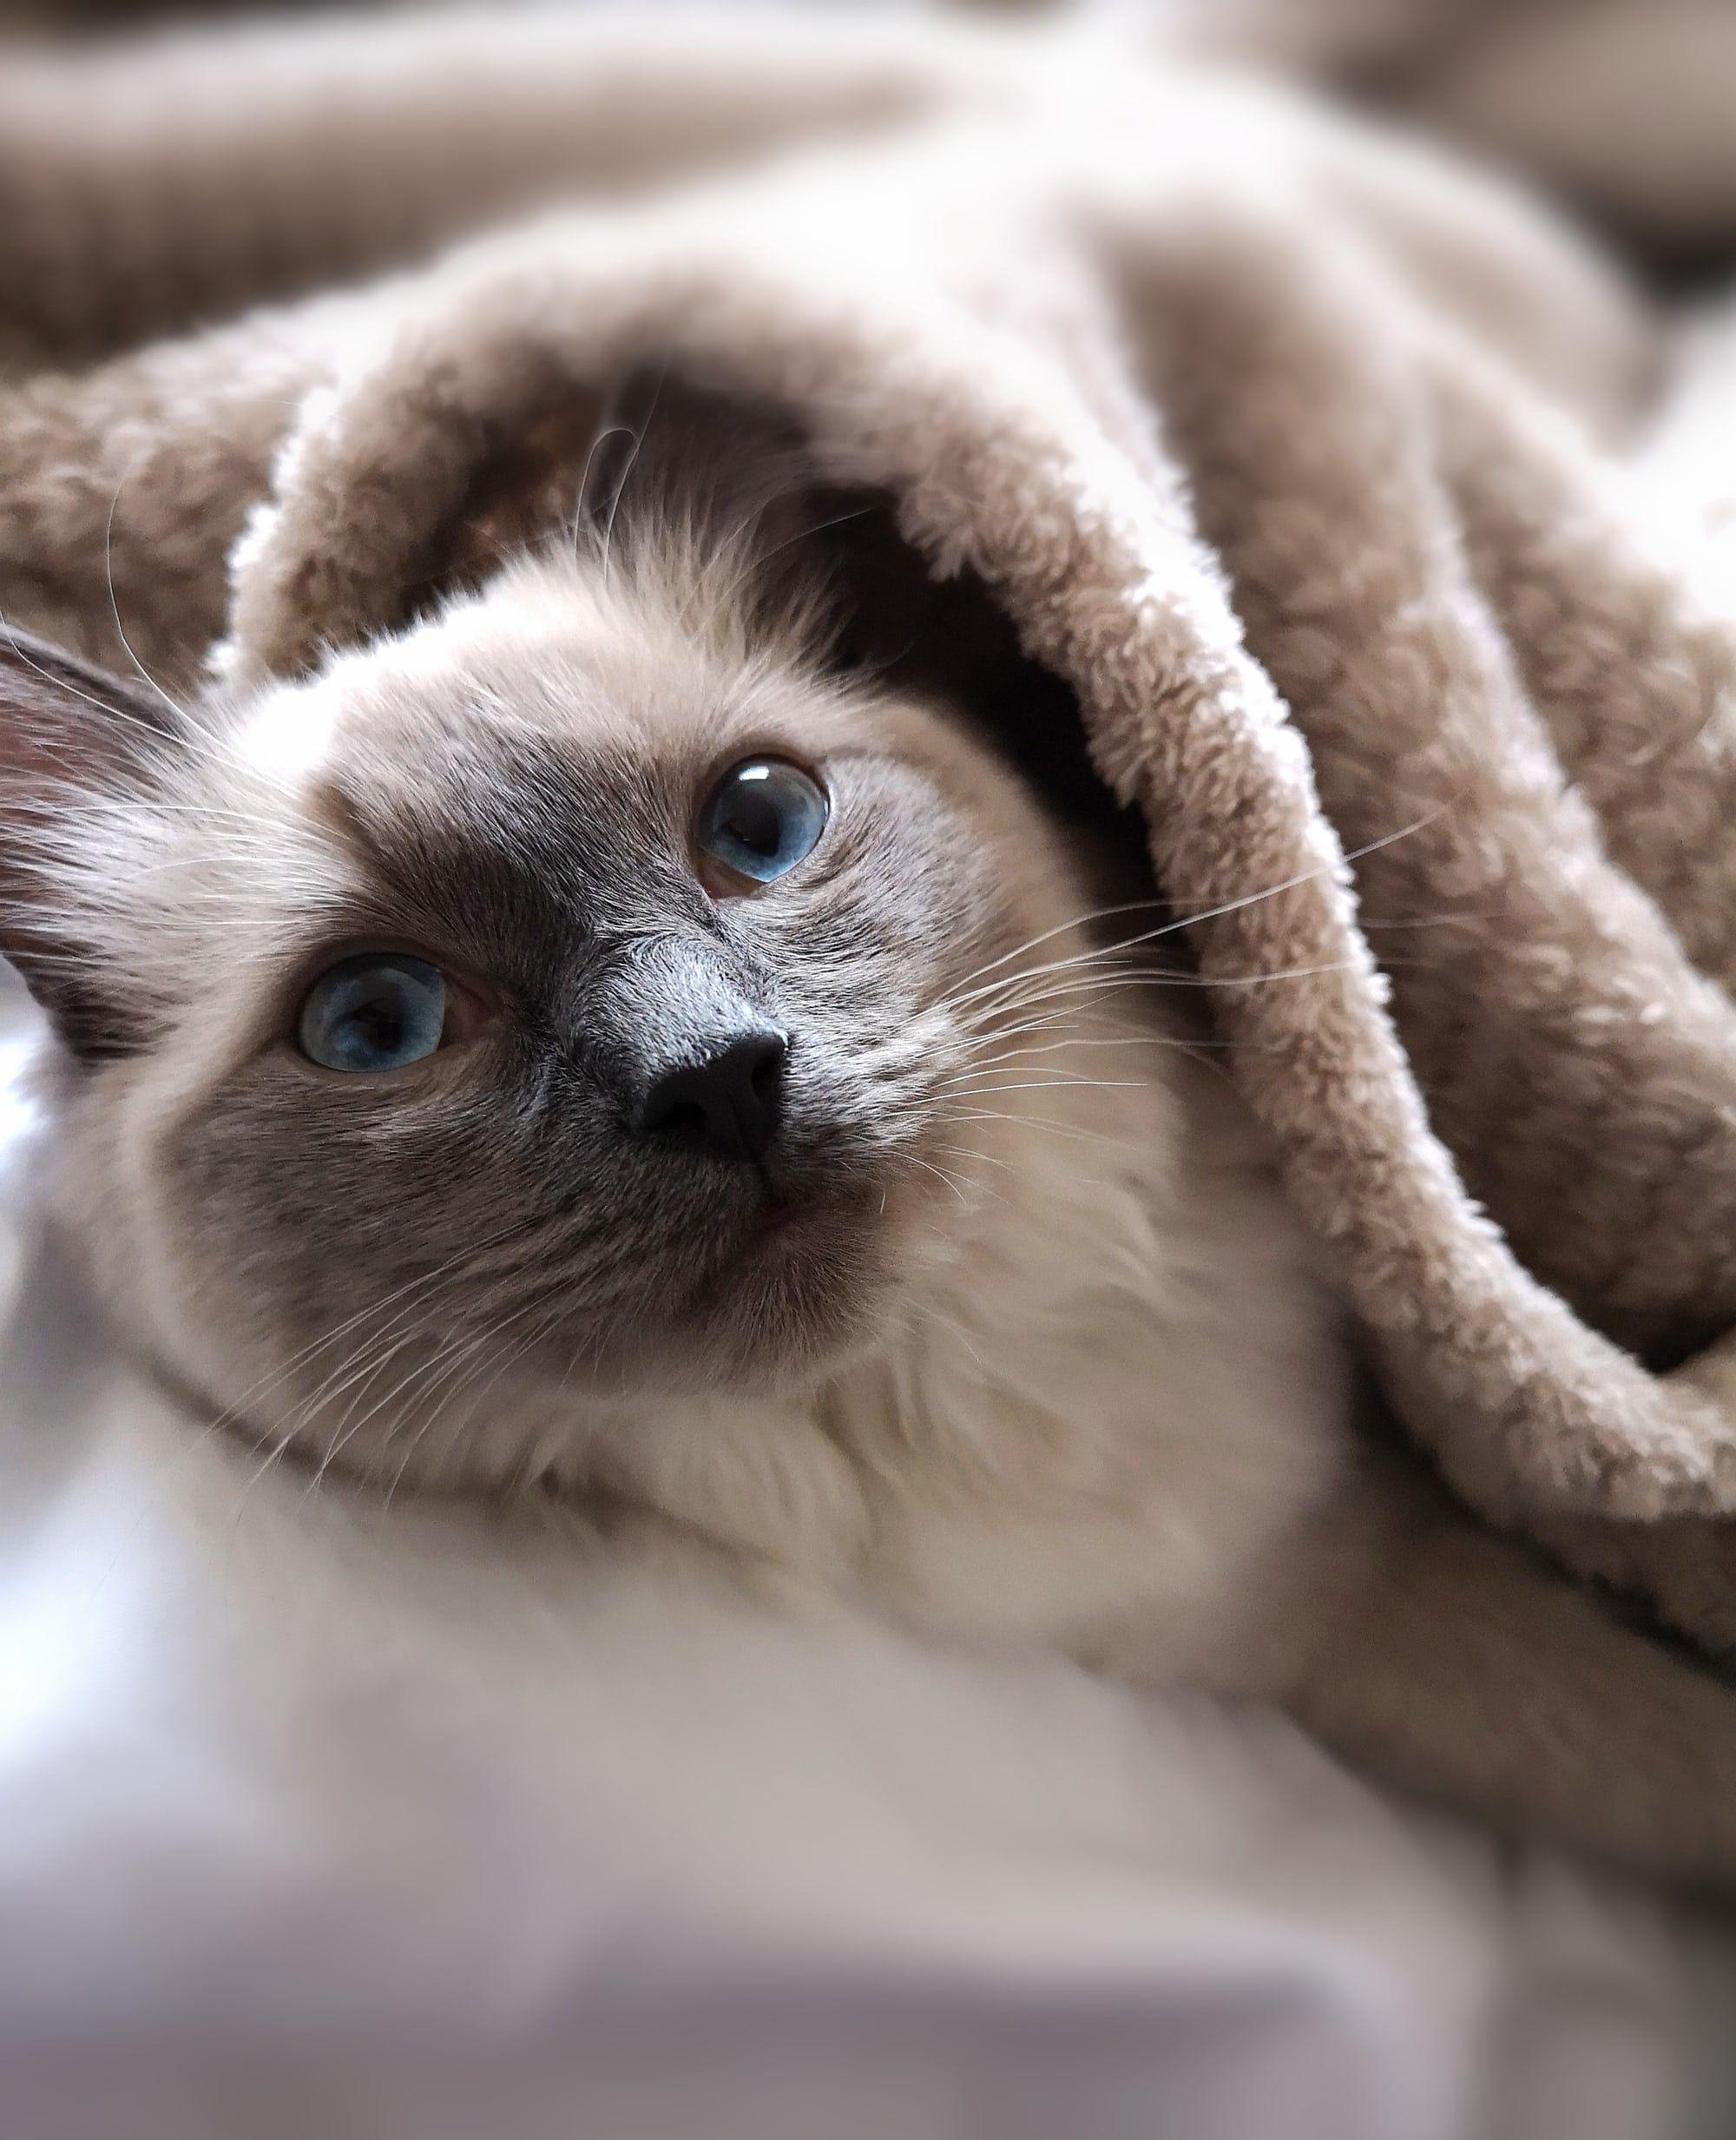 Dawhud Direct Super Soft Full Queen Size Fleece Blanket By Jenny Newland 75 X 90 Kitten Collage Cat Throw Blanket Fleece Throw Blanket Fleece Throw